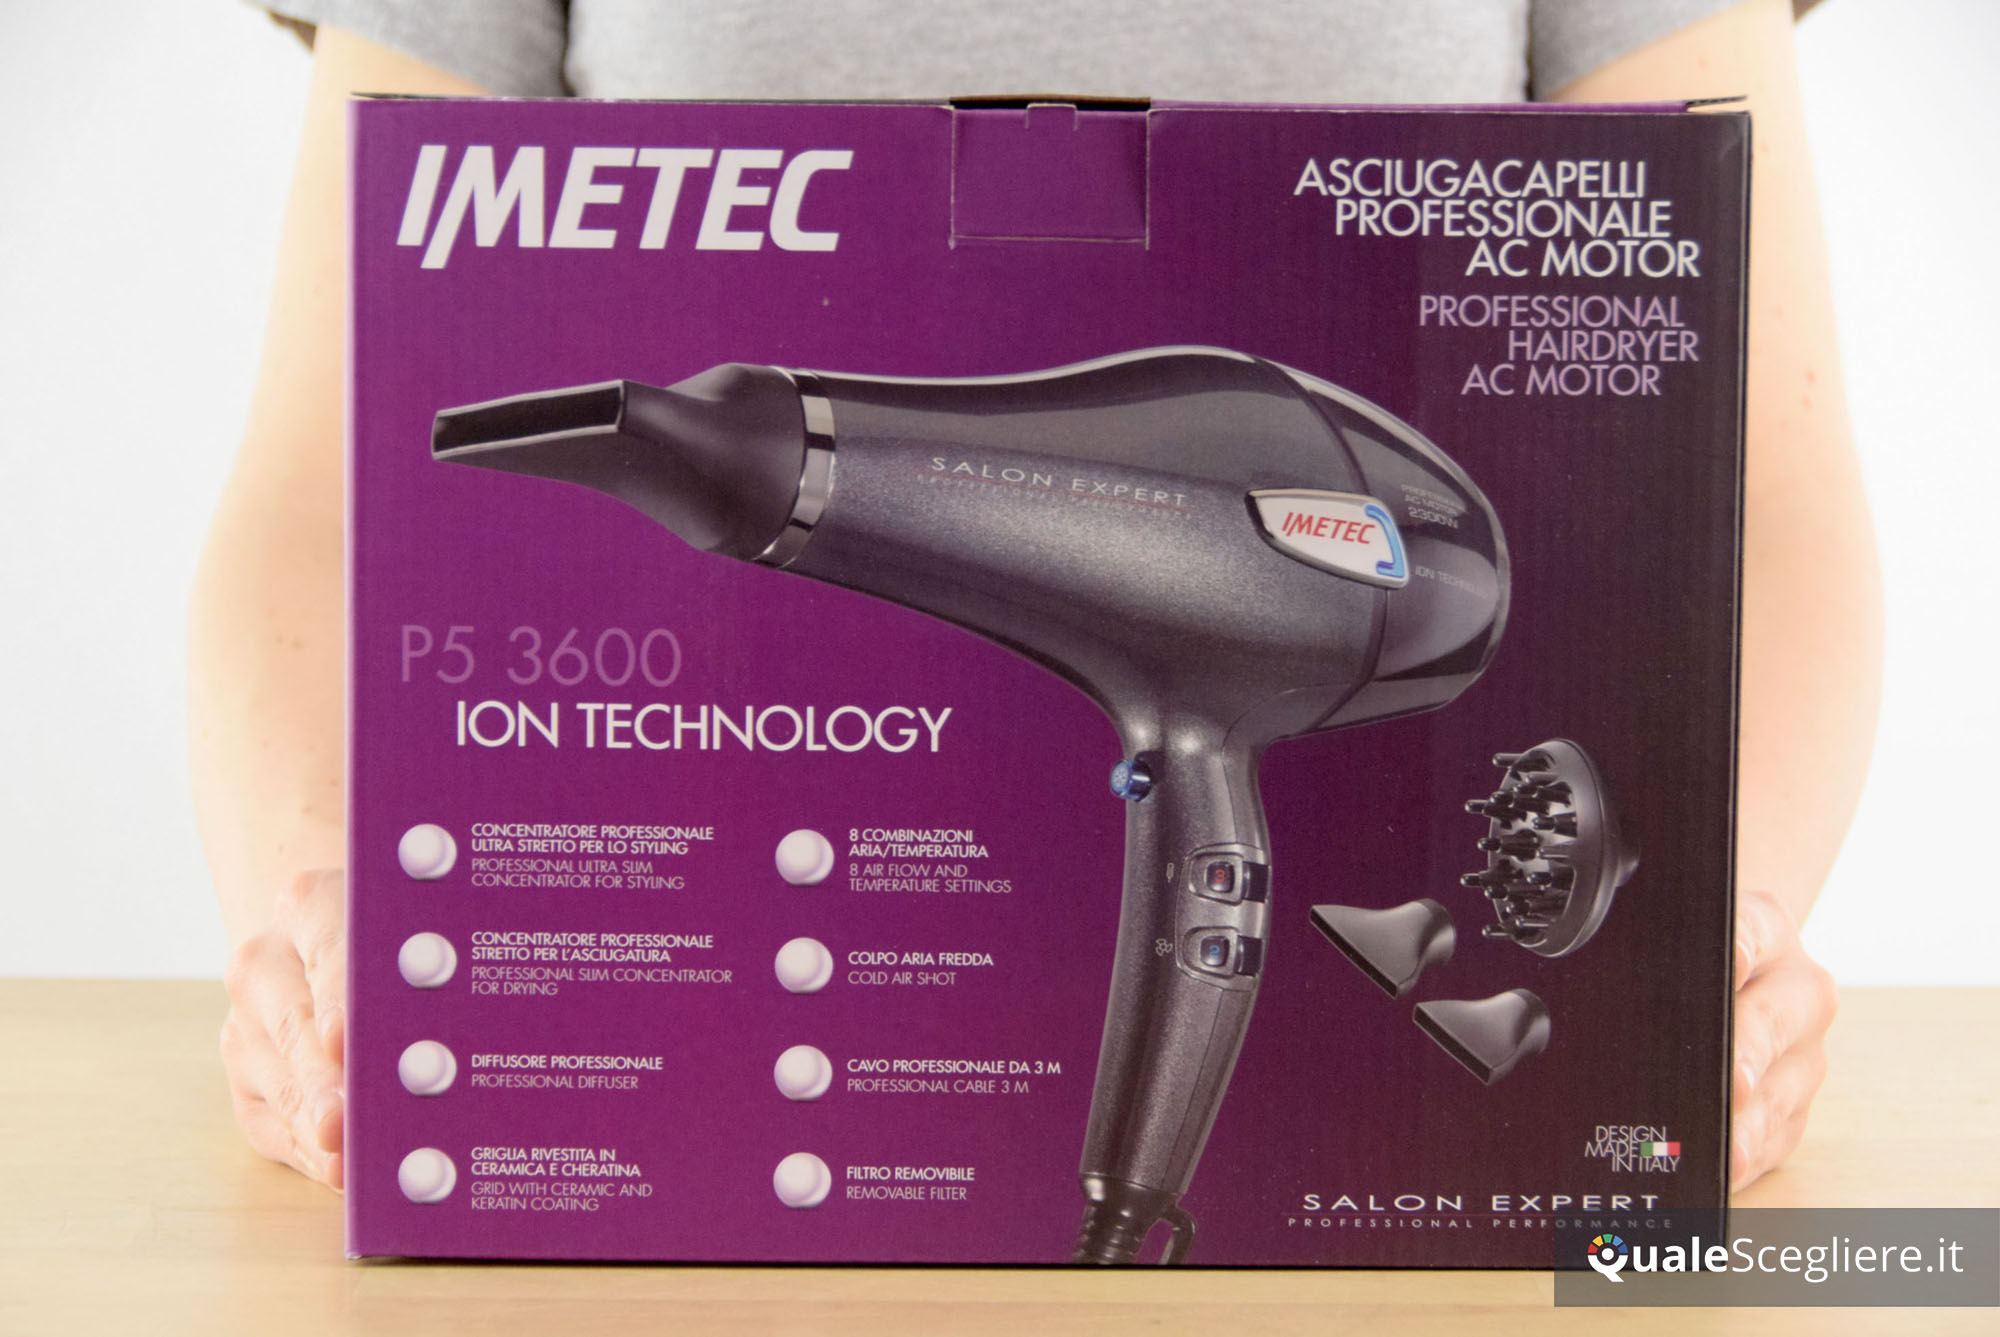 ▷ Recensione Imetec Salon Expert P5 3600  4afecbb87a